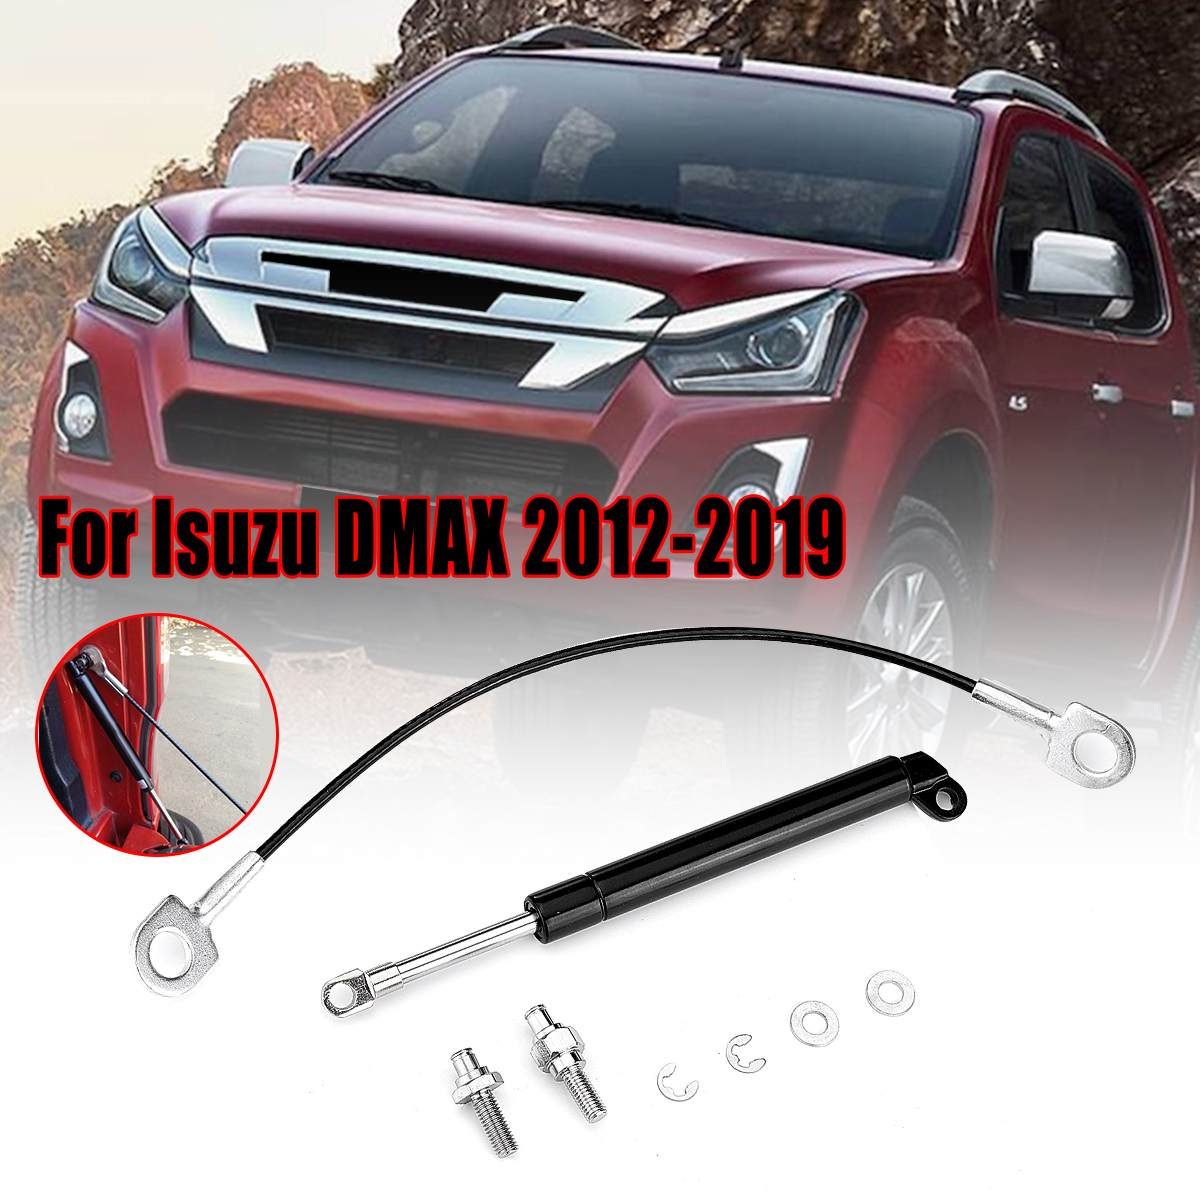 "EMBLEM Carbon+RED LOGO FRONT /""ISUZU/"" FOR ALL NEW ISUZU MU-X UTE SUV 2012-2014"